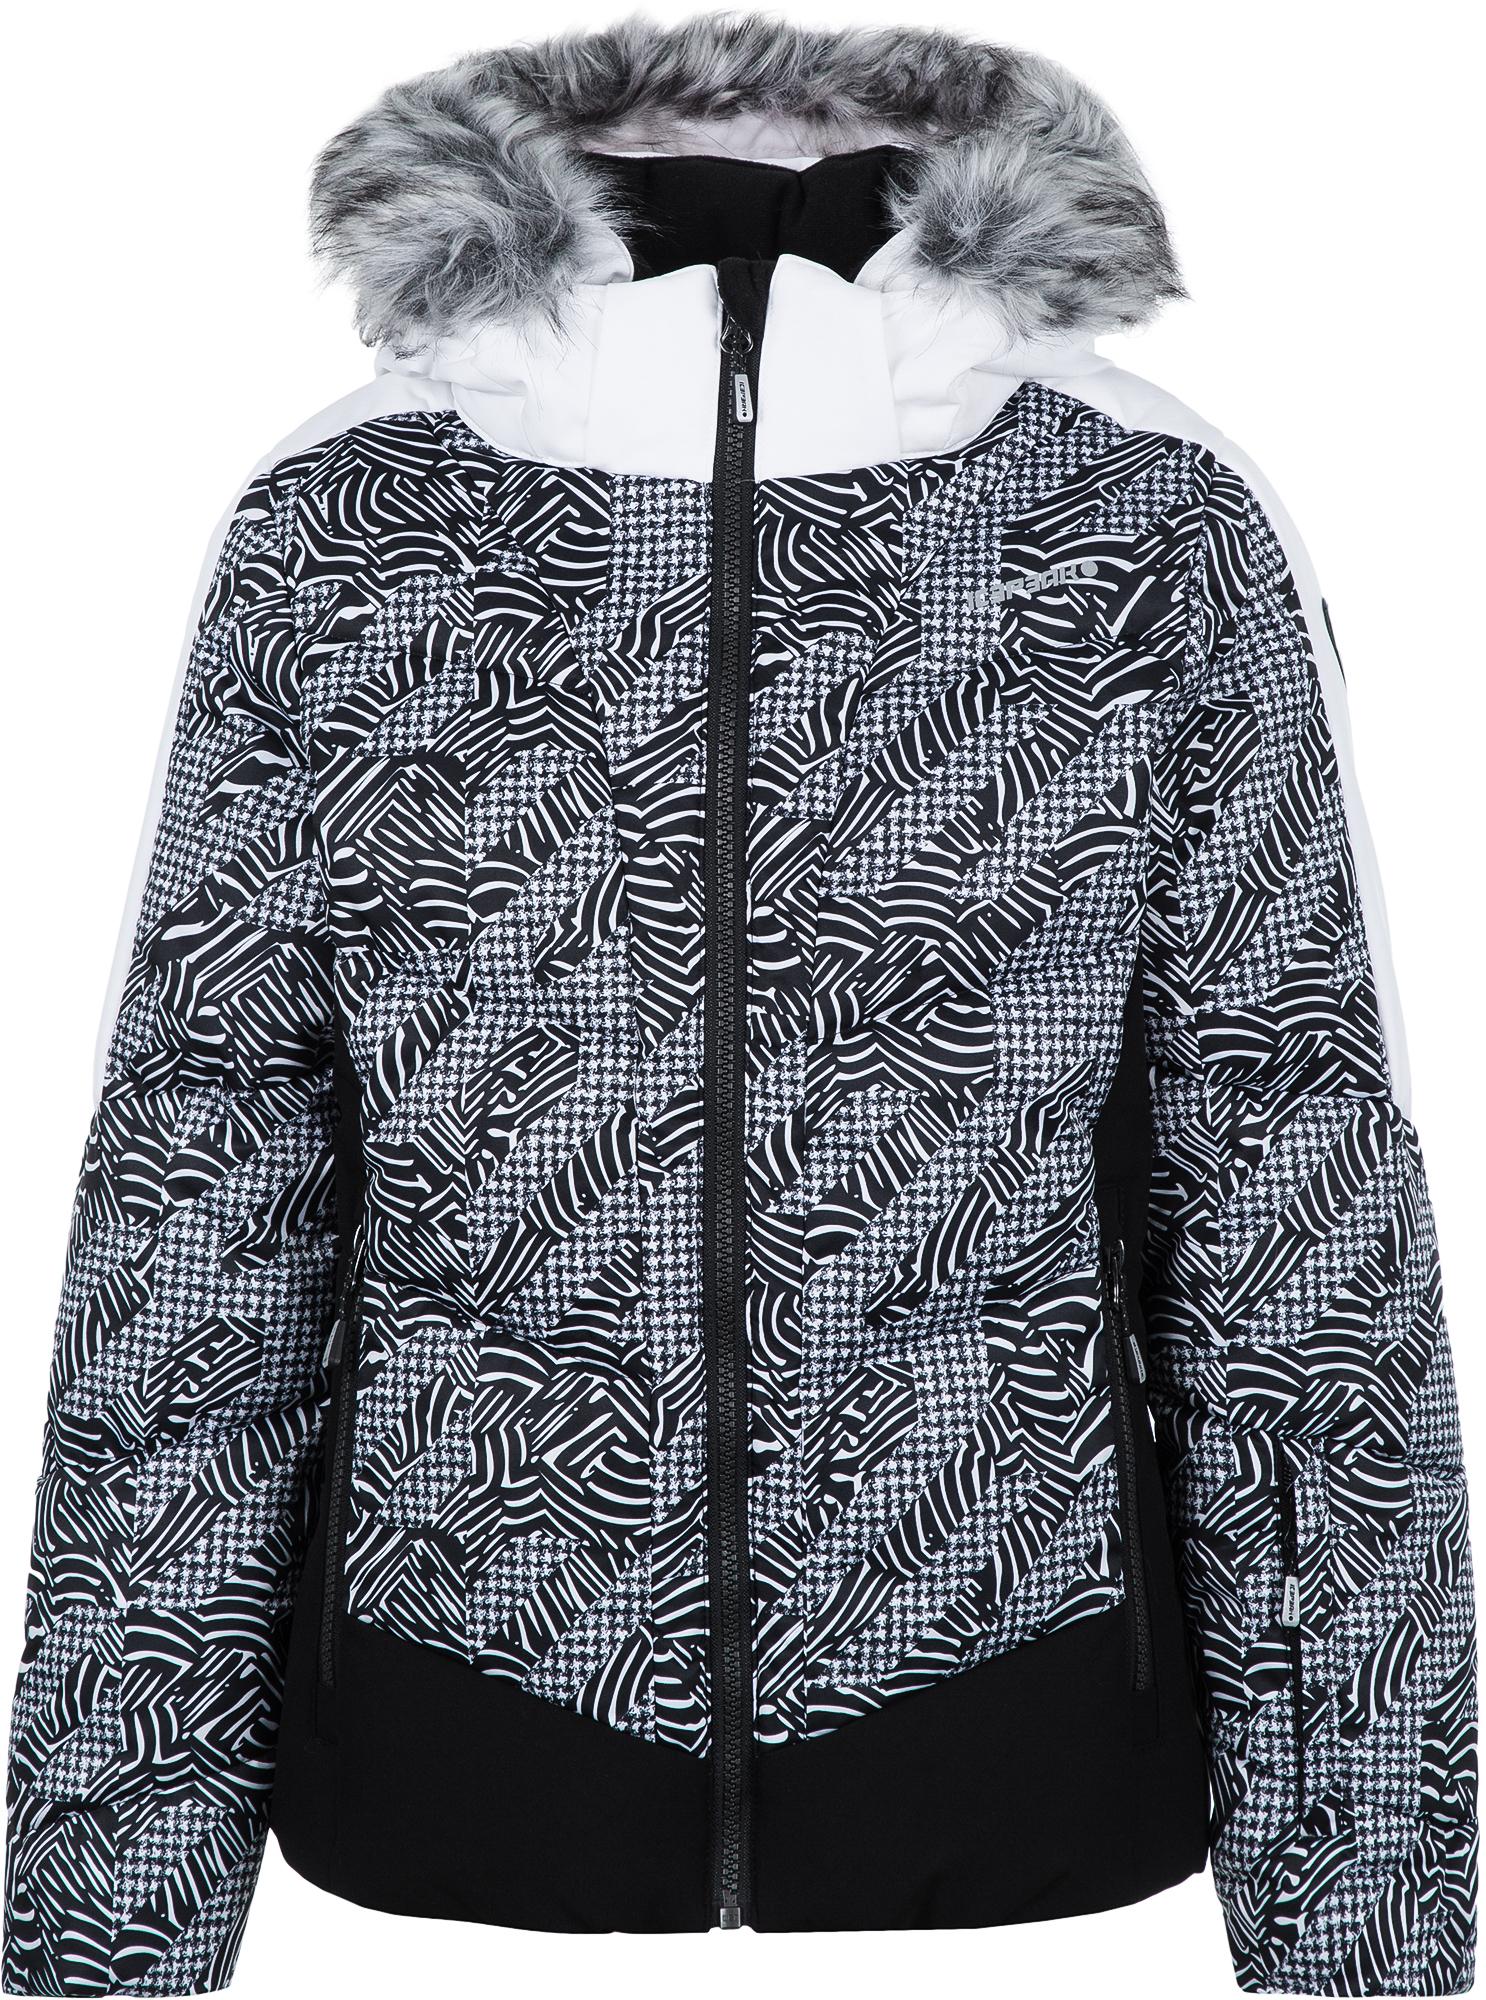 IcePeak Куртка утепленная для девочек IcePeak Leal, размер 164 костюм куртка брюки для девочек icepeak 452002654iv цвет фиолетовый р 164 100%полиэстер 740